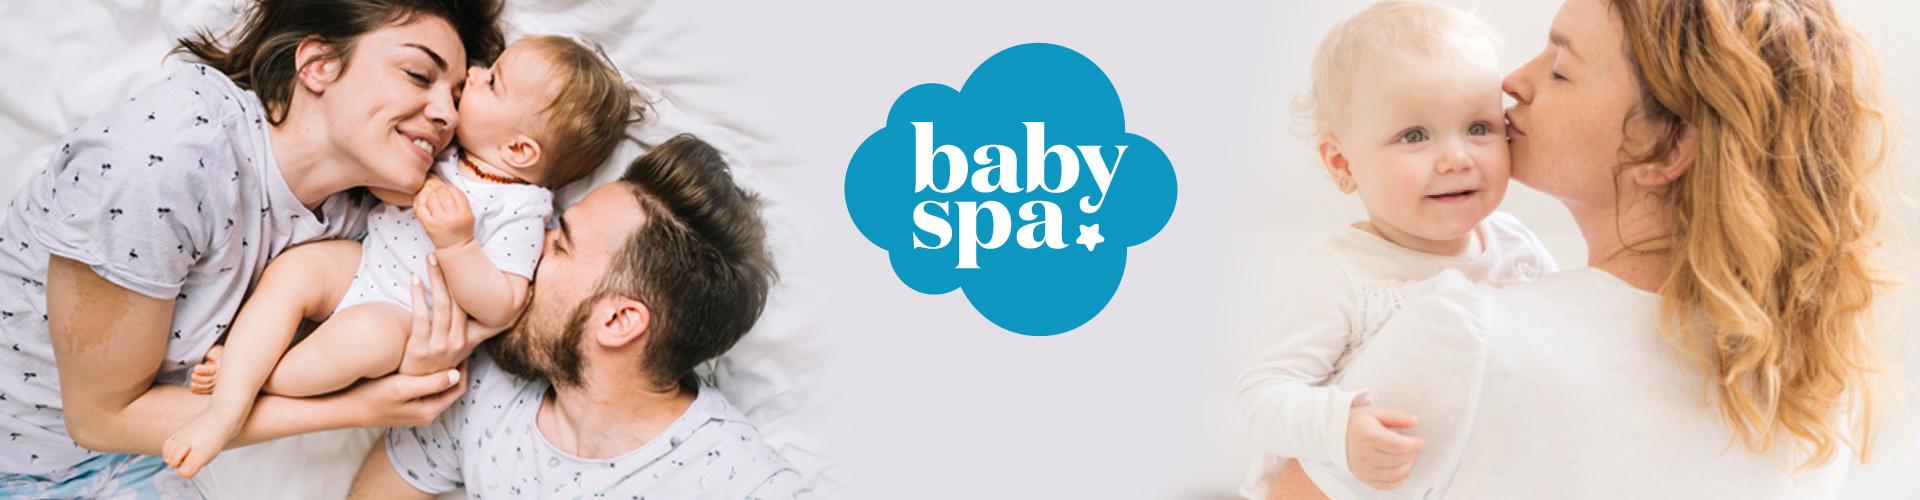 Baneri-za-sajt-Baby-Spa-02